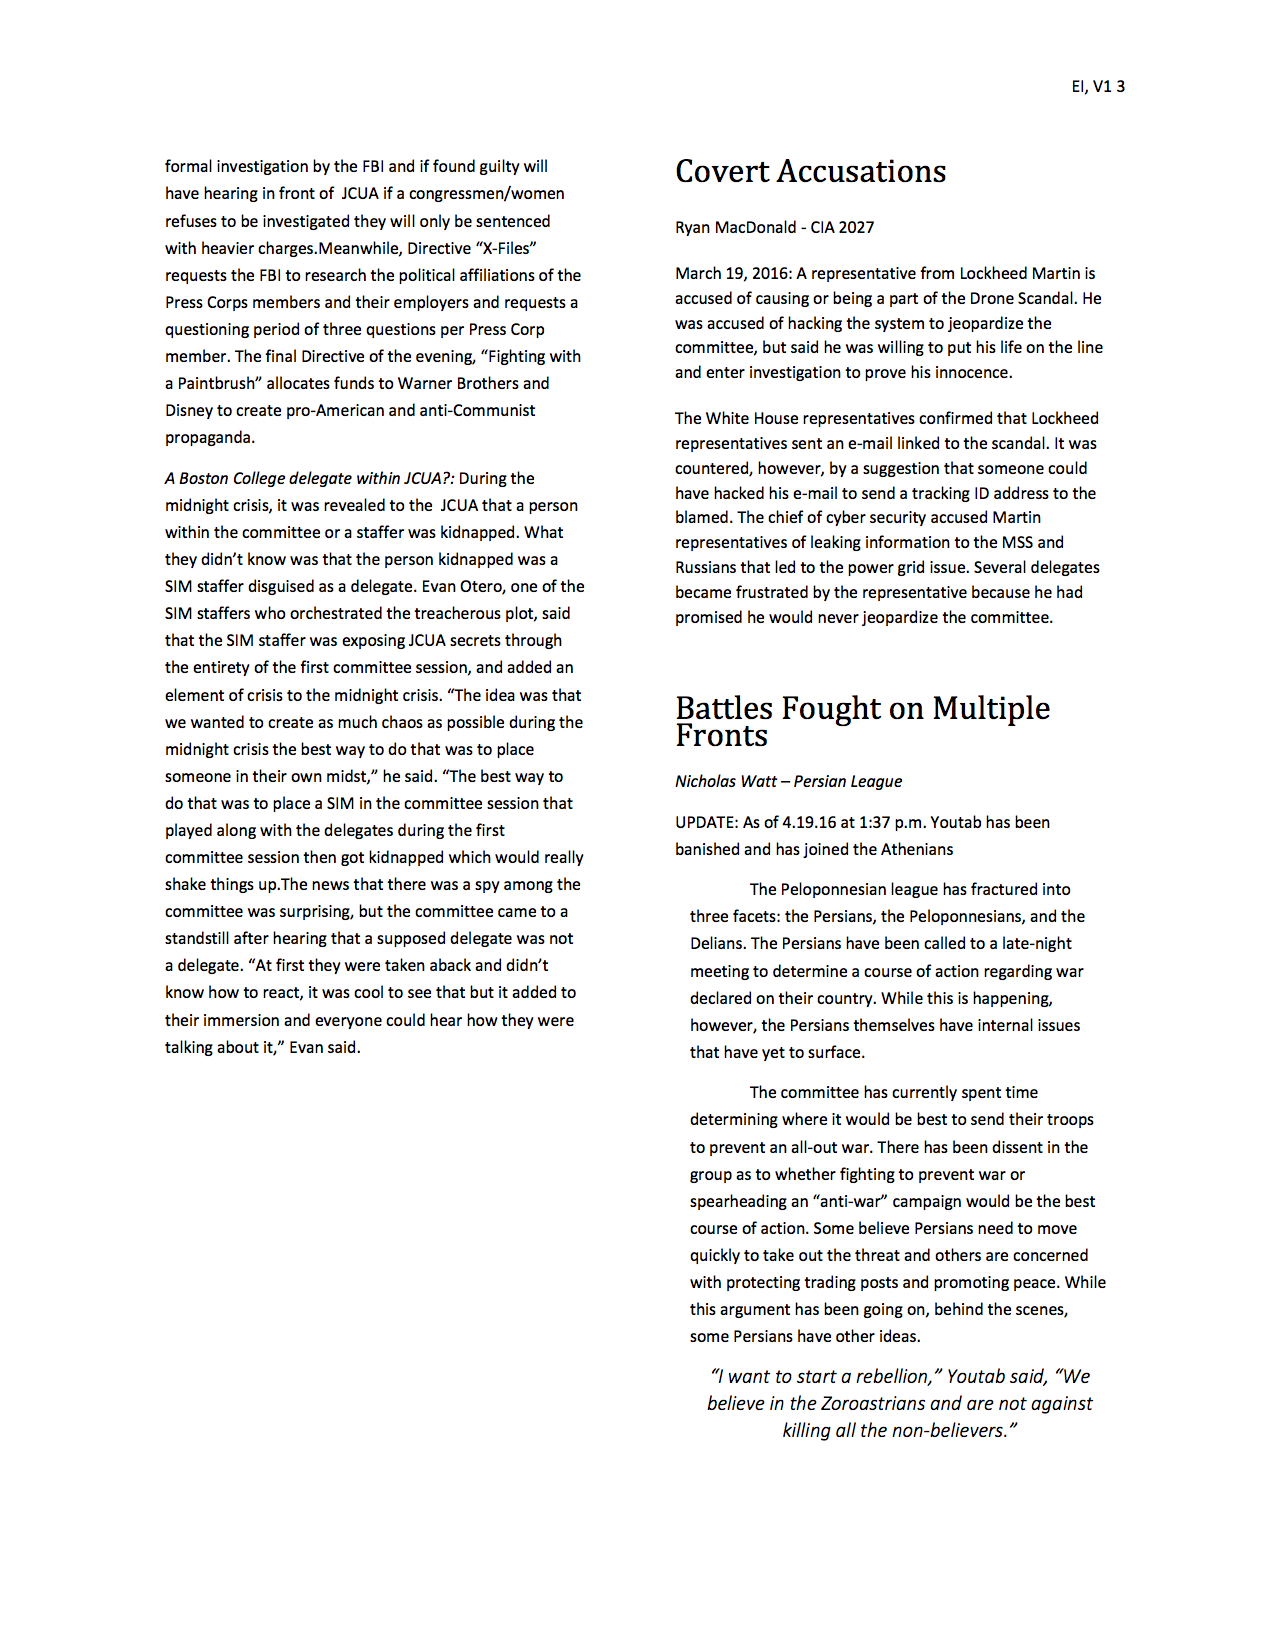 FINALEagle_International_News_(3).jpg